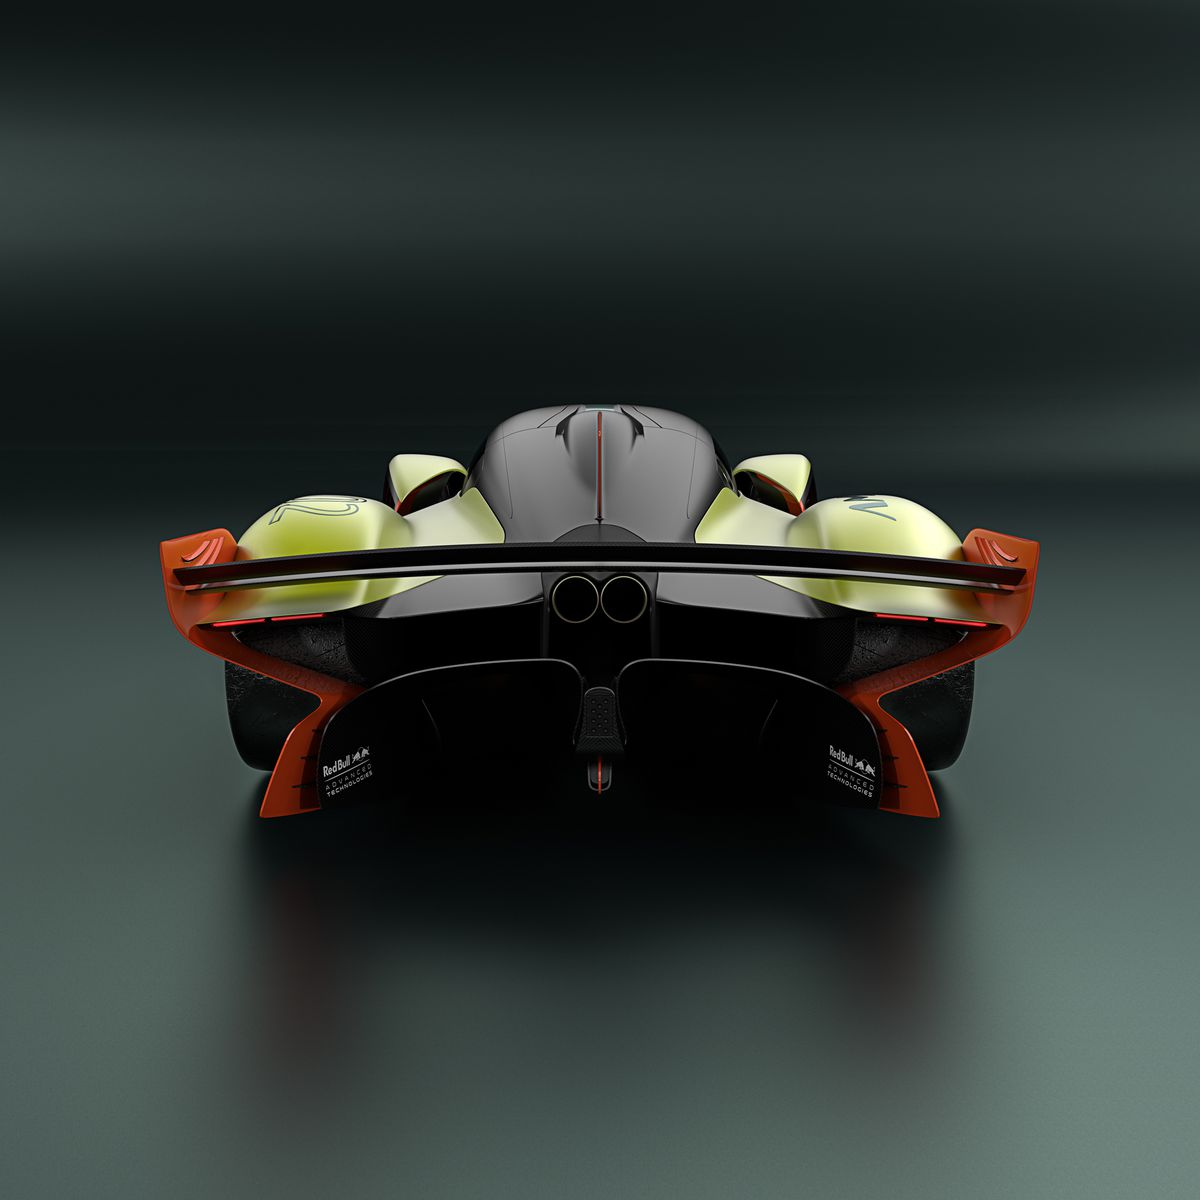 Aston Martin Valkyrie Sport: Aston Martin's New Hypercar Is An 1,100 Horsepower Asphalt